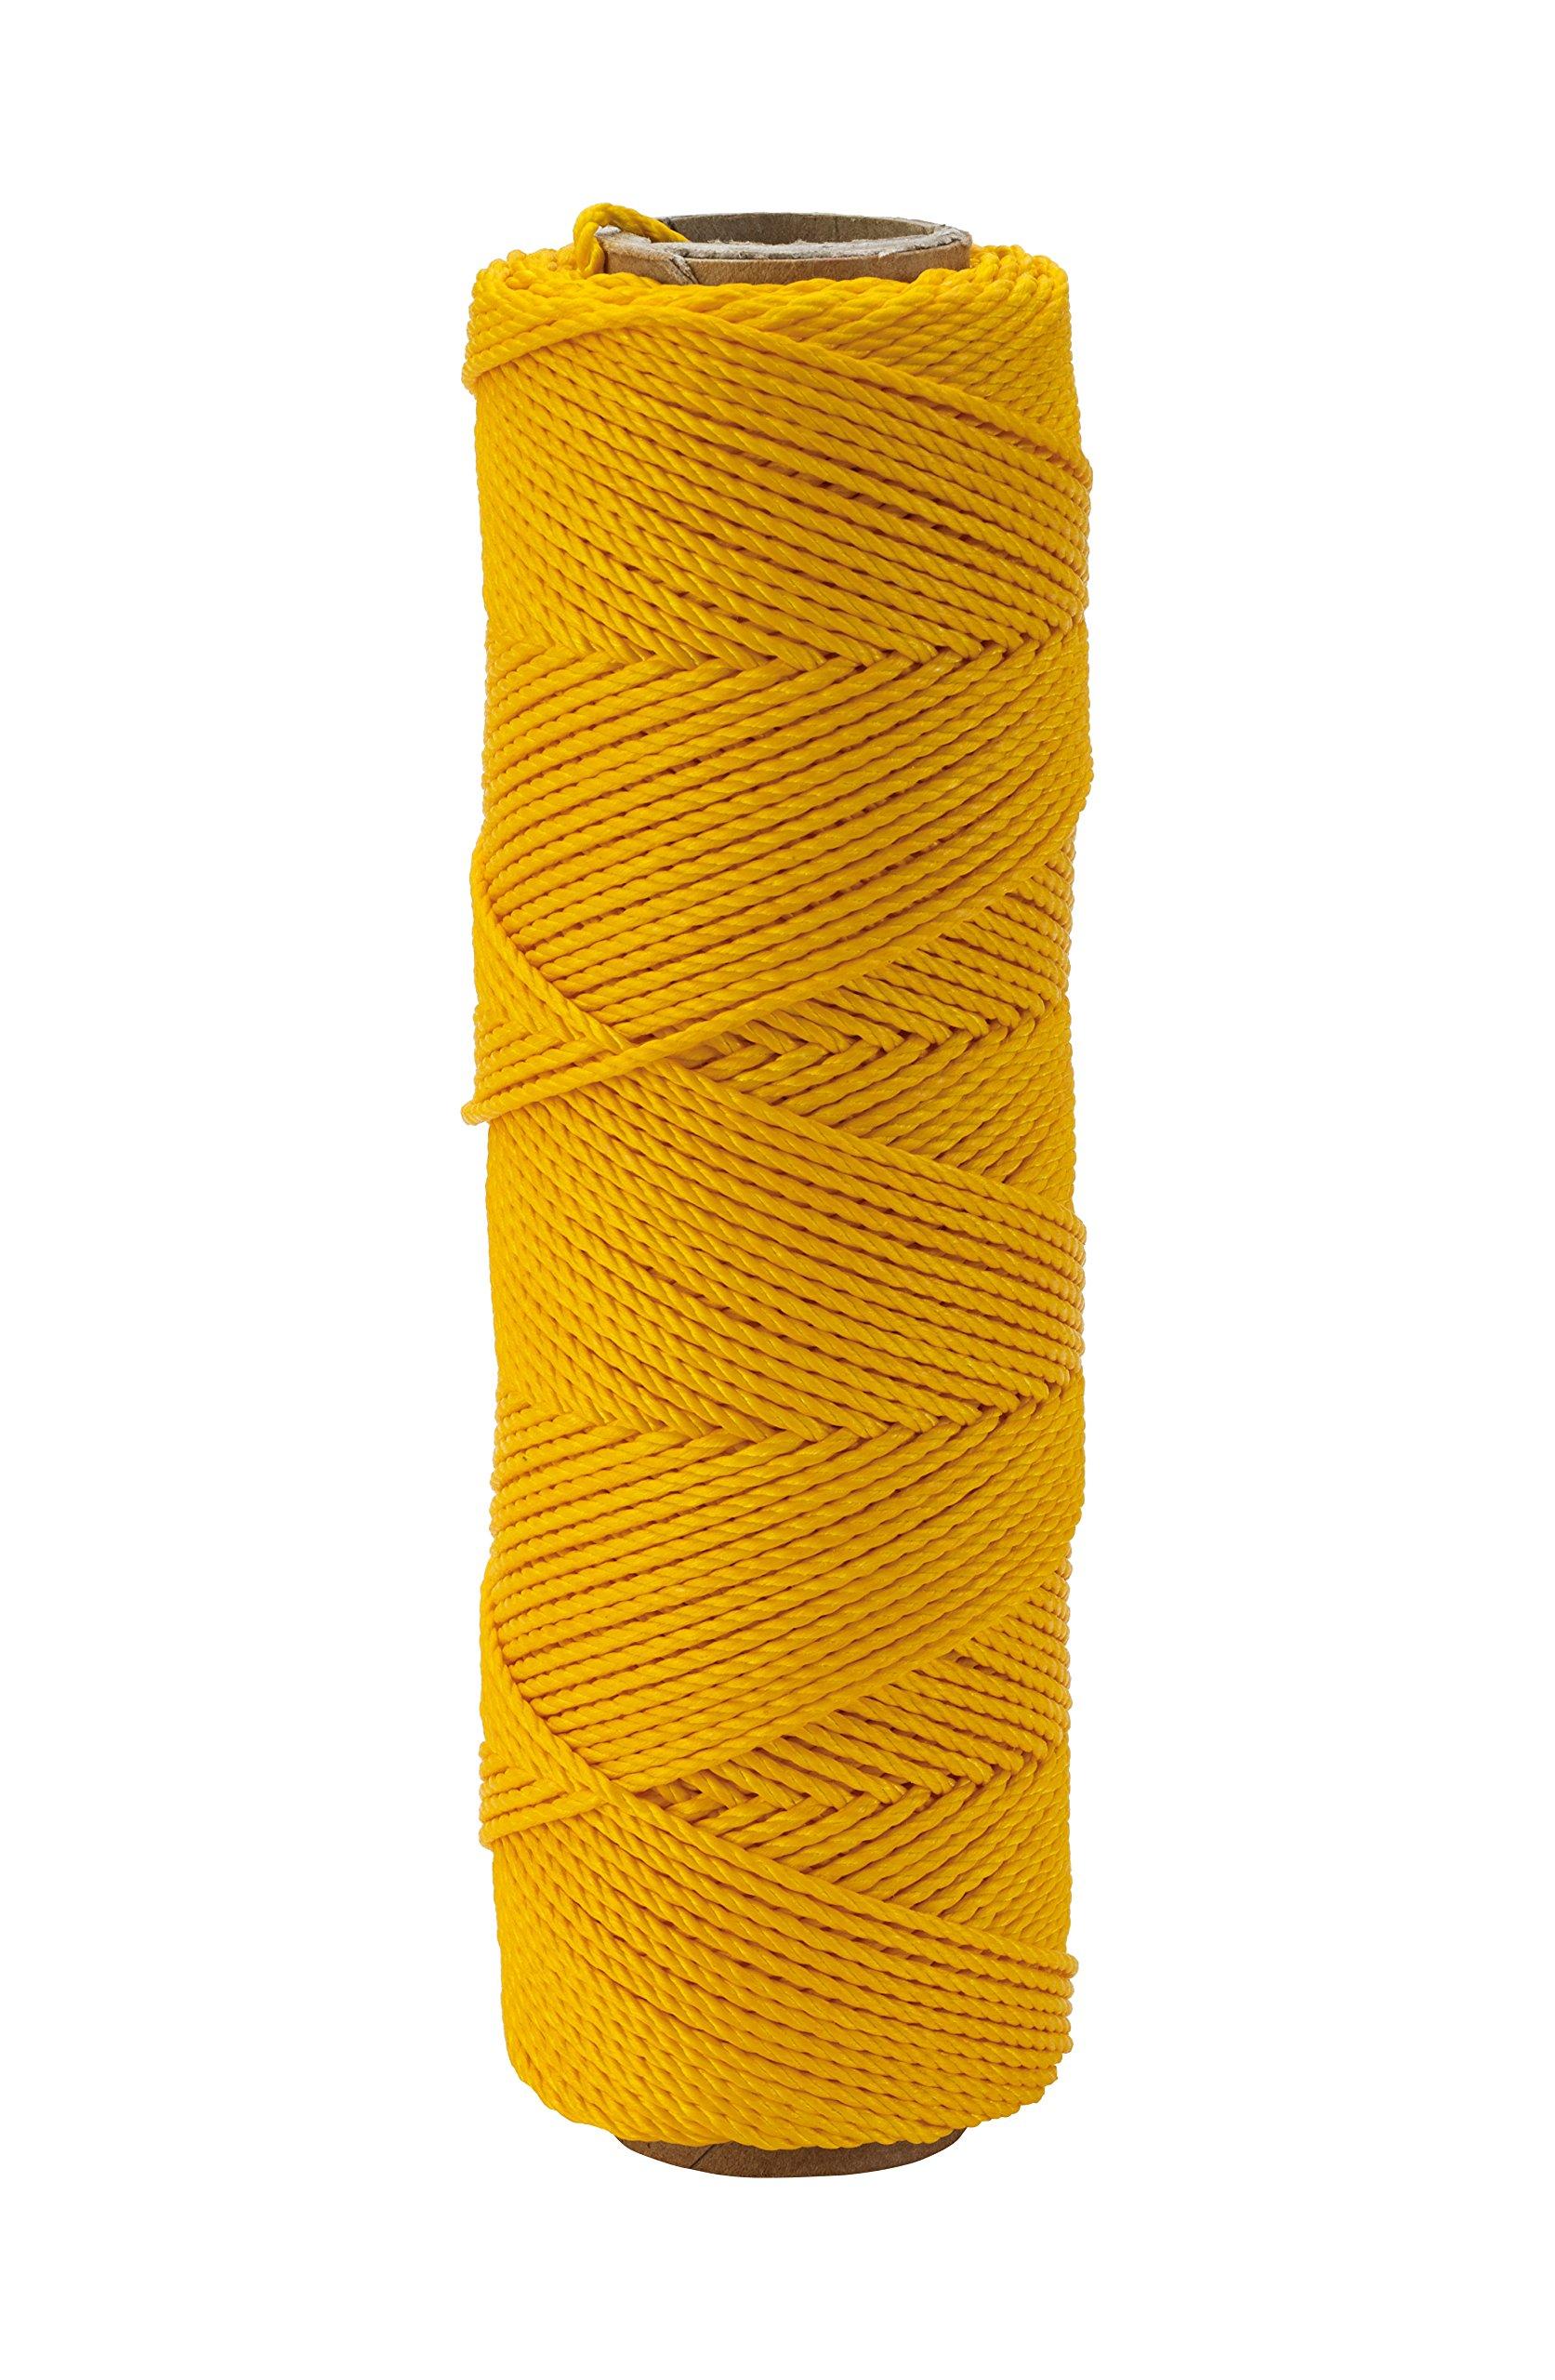 Mutual Industries 14661-41-275 Nylon Mason Twine, 1/4 lb. Twisted, 18 x 275', Yellow (Pack of 6)